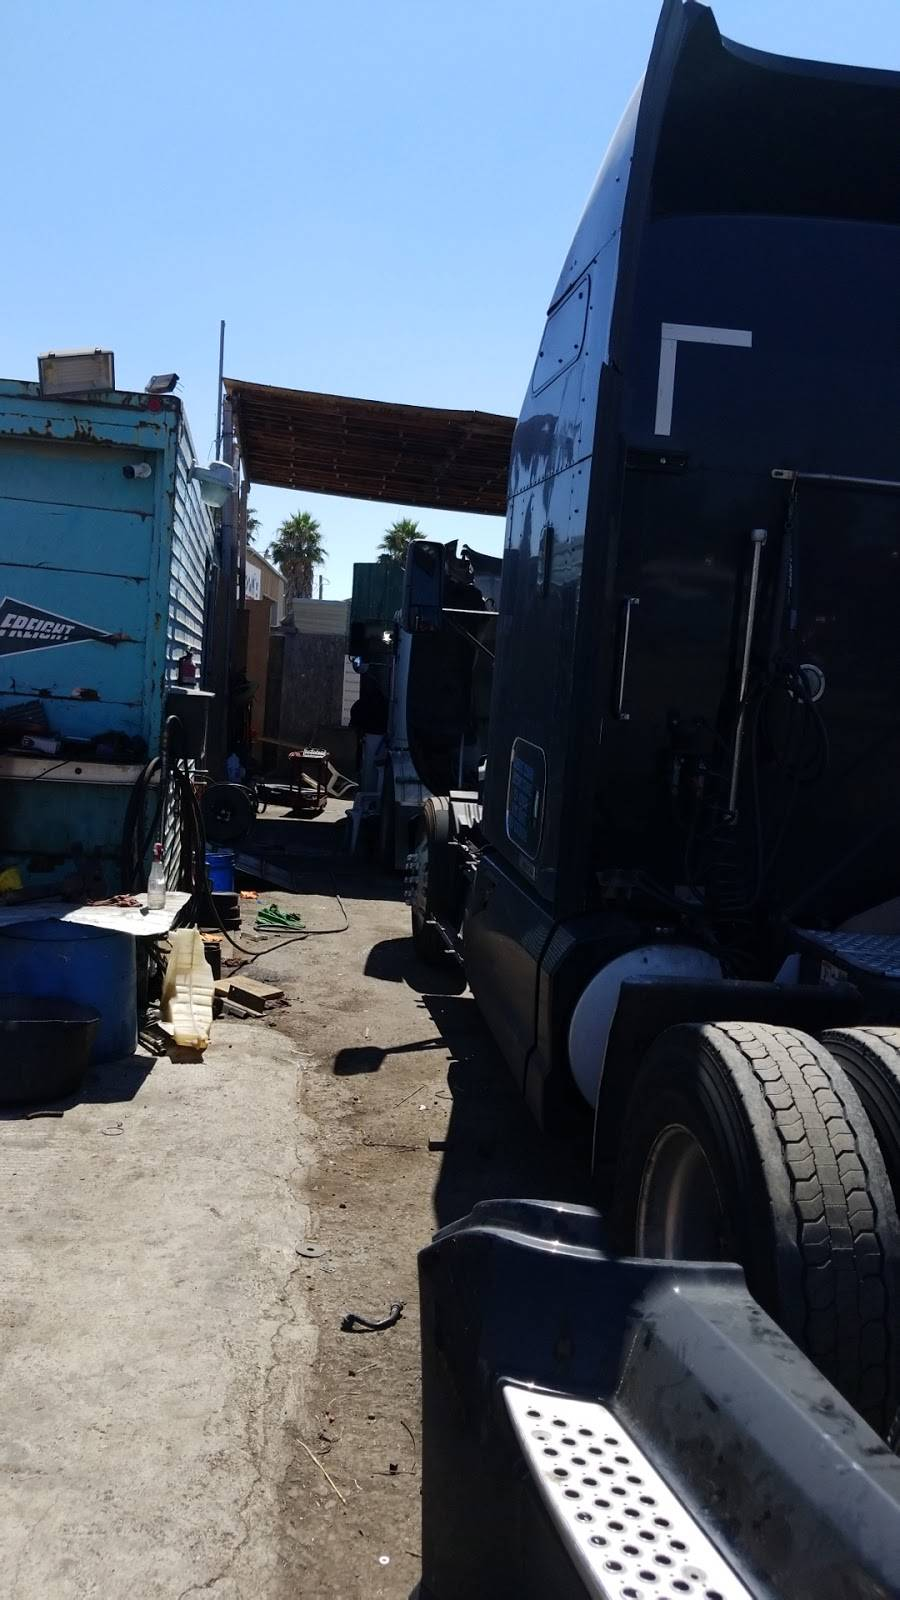 I5 Truck Trailer Repair - car repair  | Photo 4 of 5 | Address: Lathrop, CA 95330, USA | Phone: (510) 589-3811